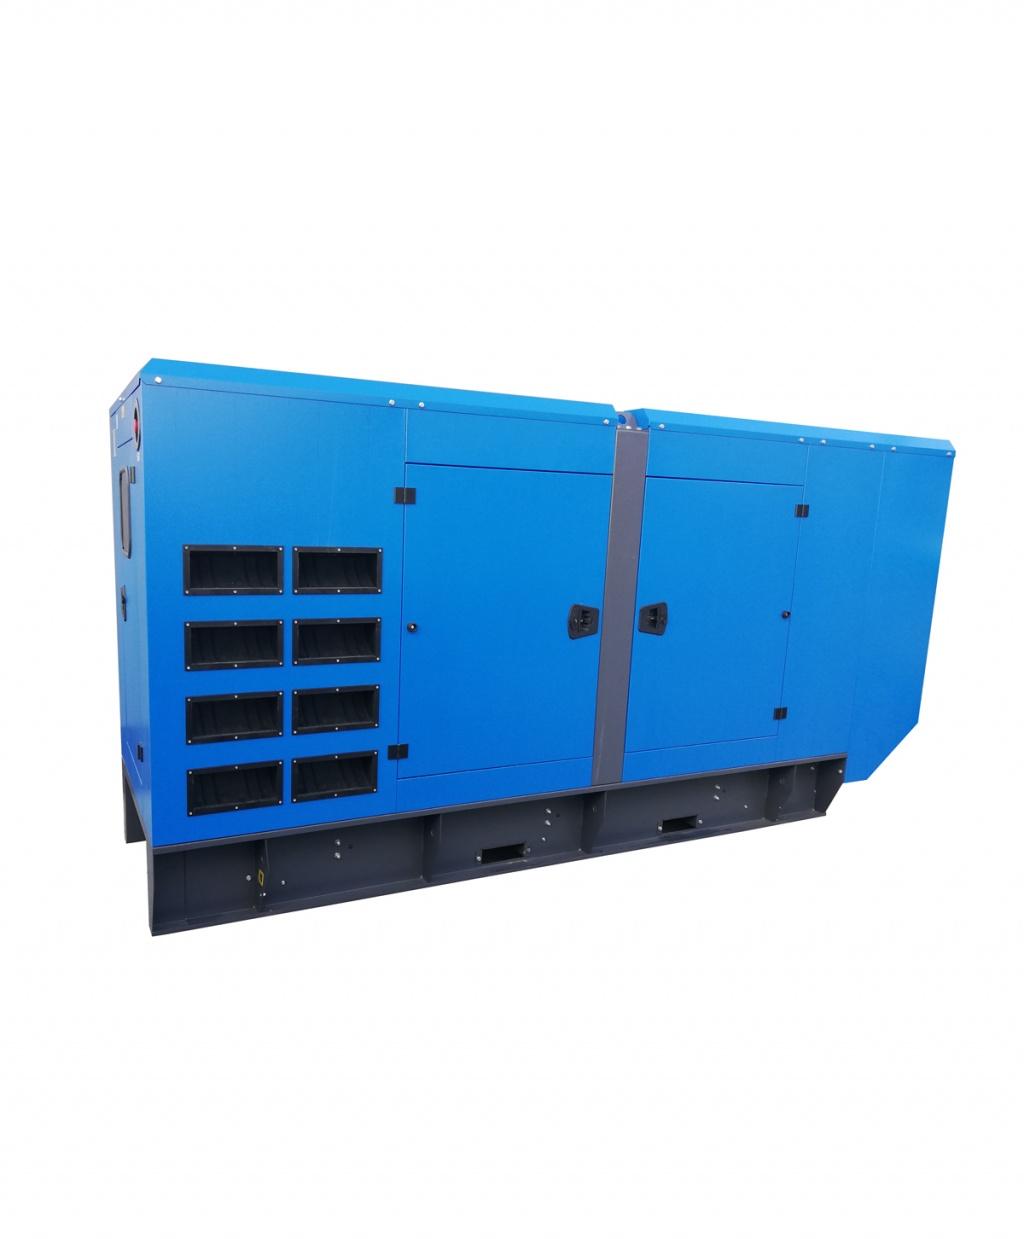 Agregat prądotwórczy PW 150 ED